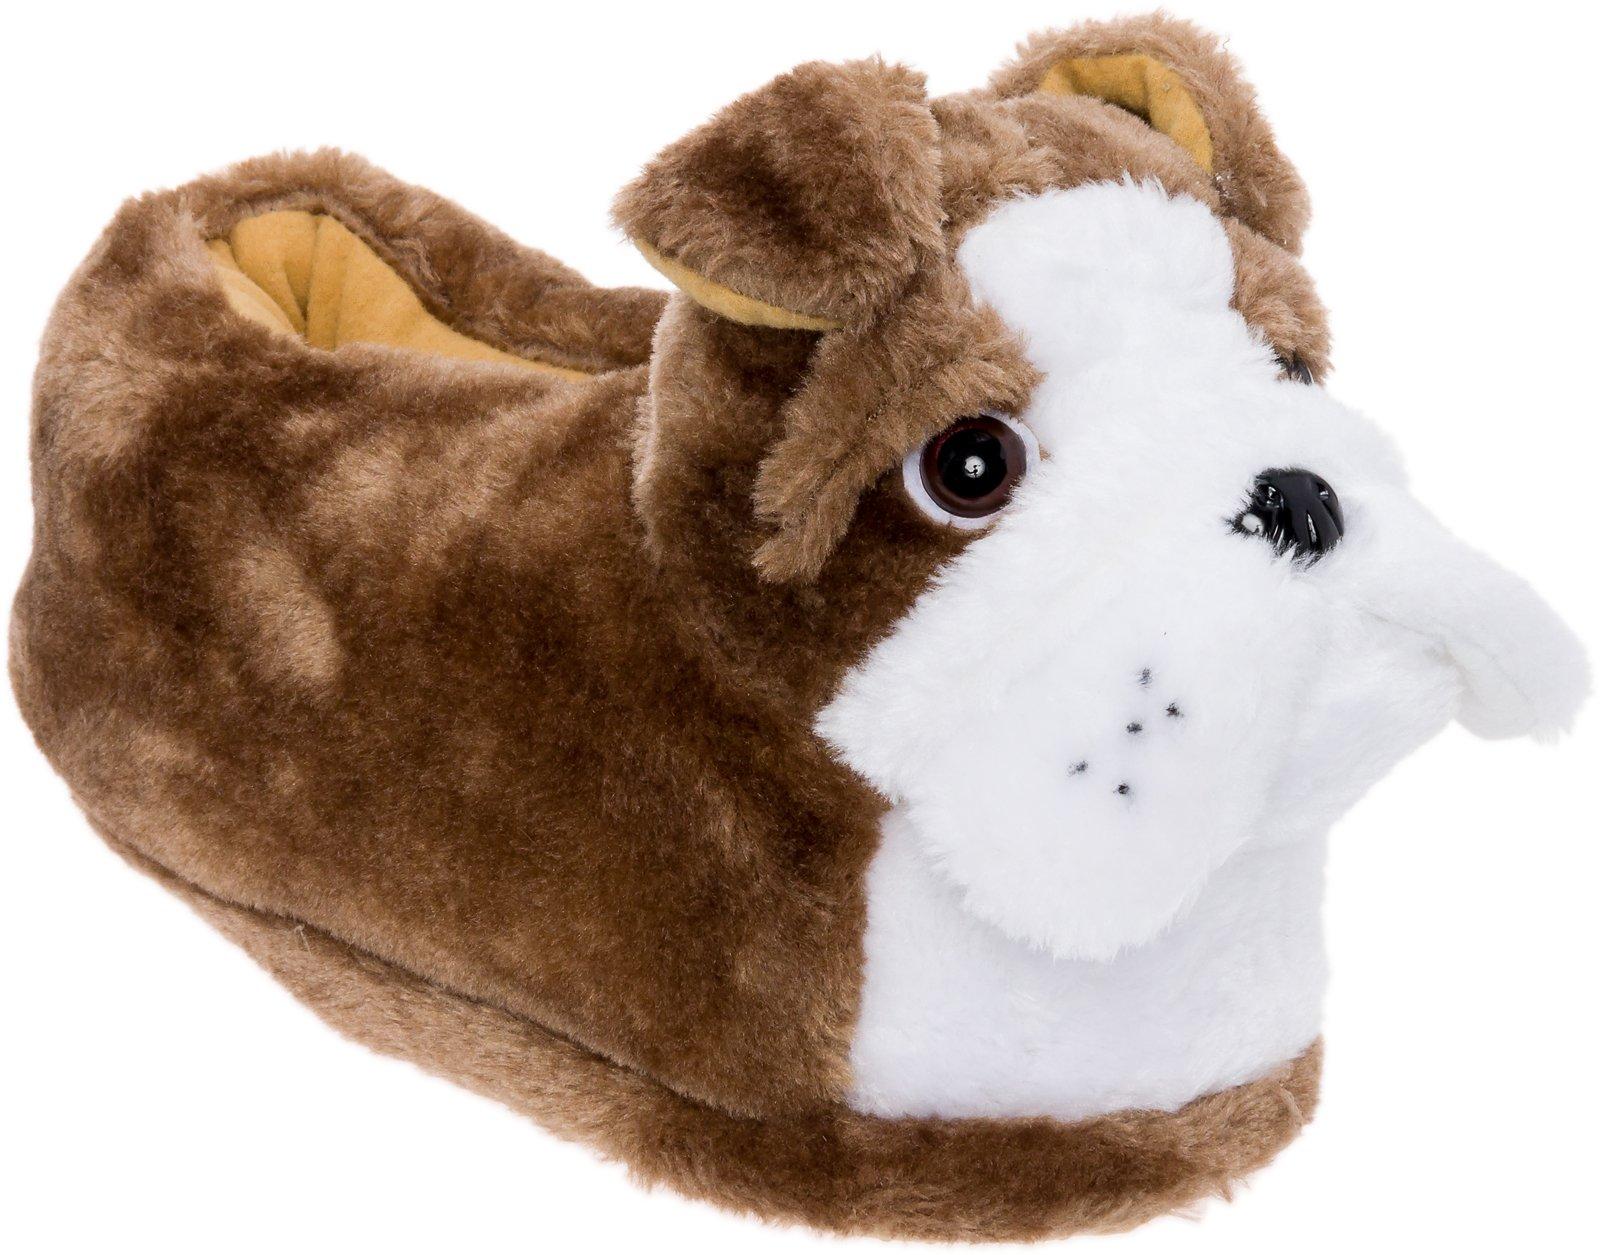 Silver Lilly English Bulldog Slippers - Plush Animal Slippers w/Platform by (Tan/White, Medium)